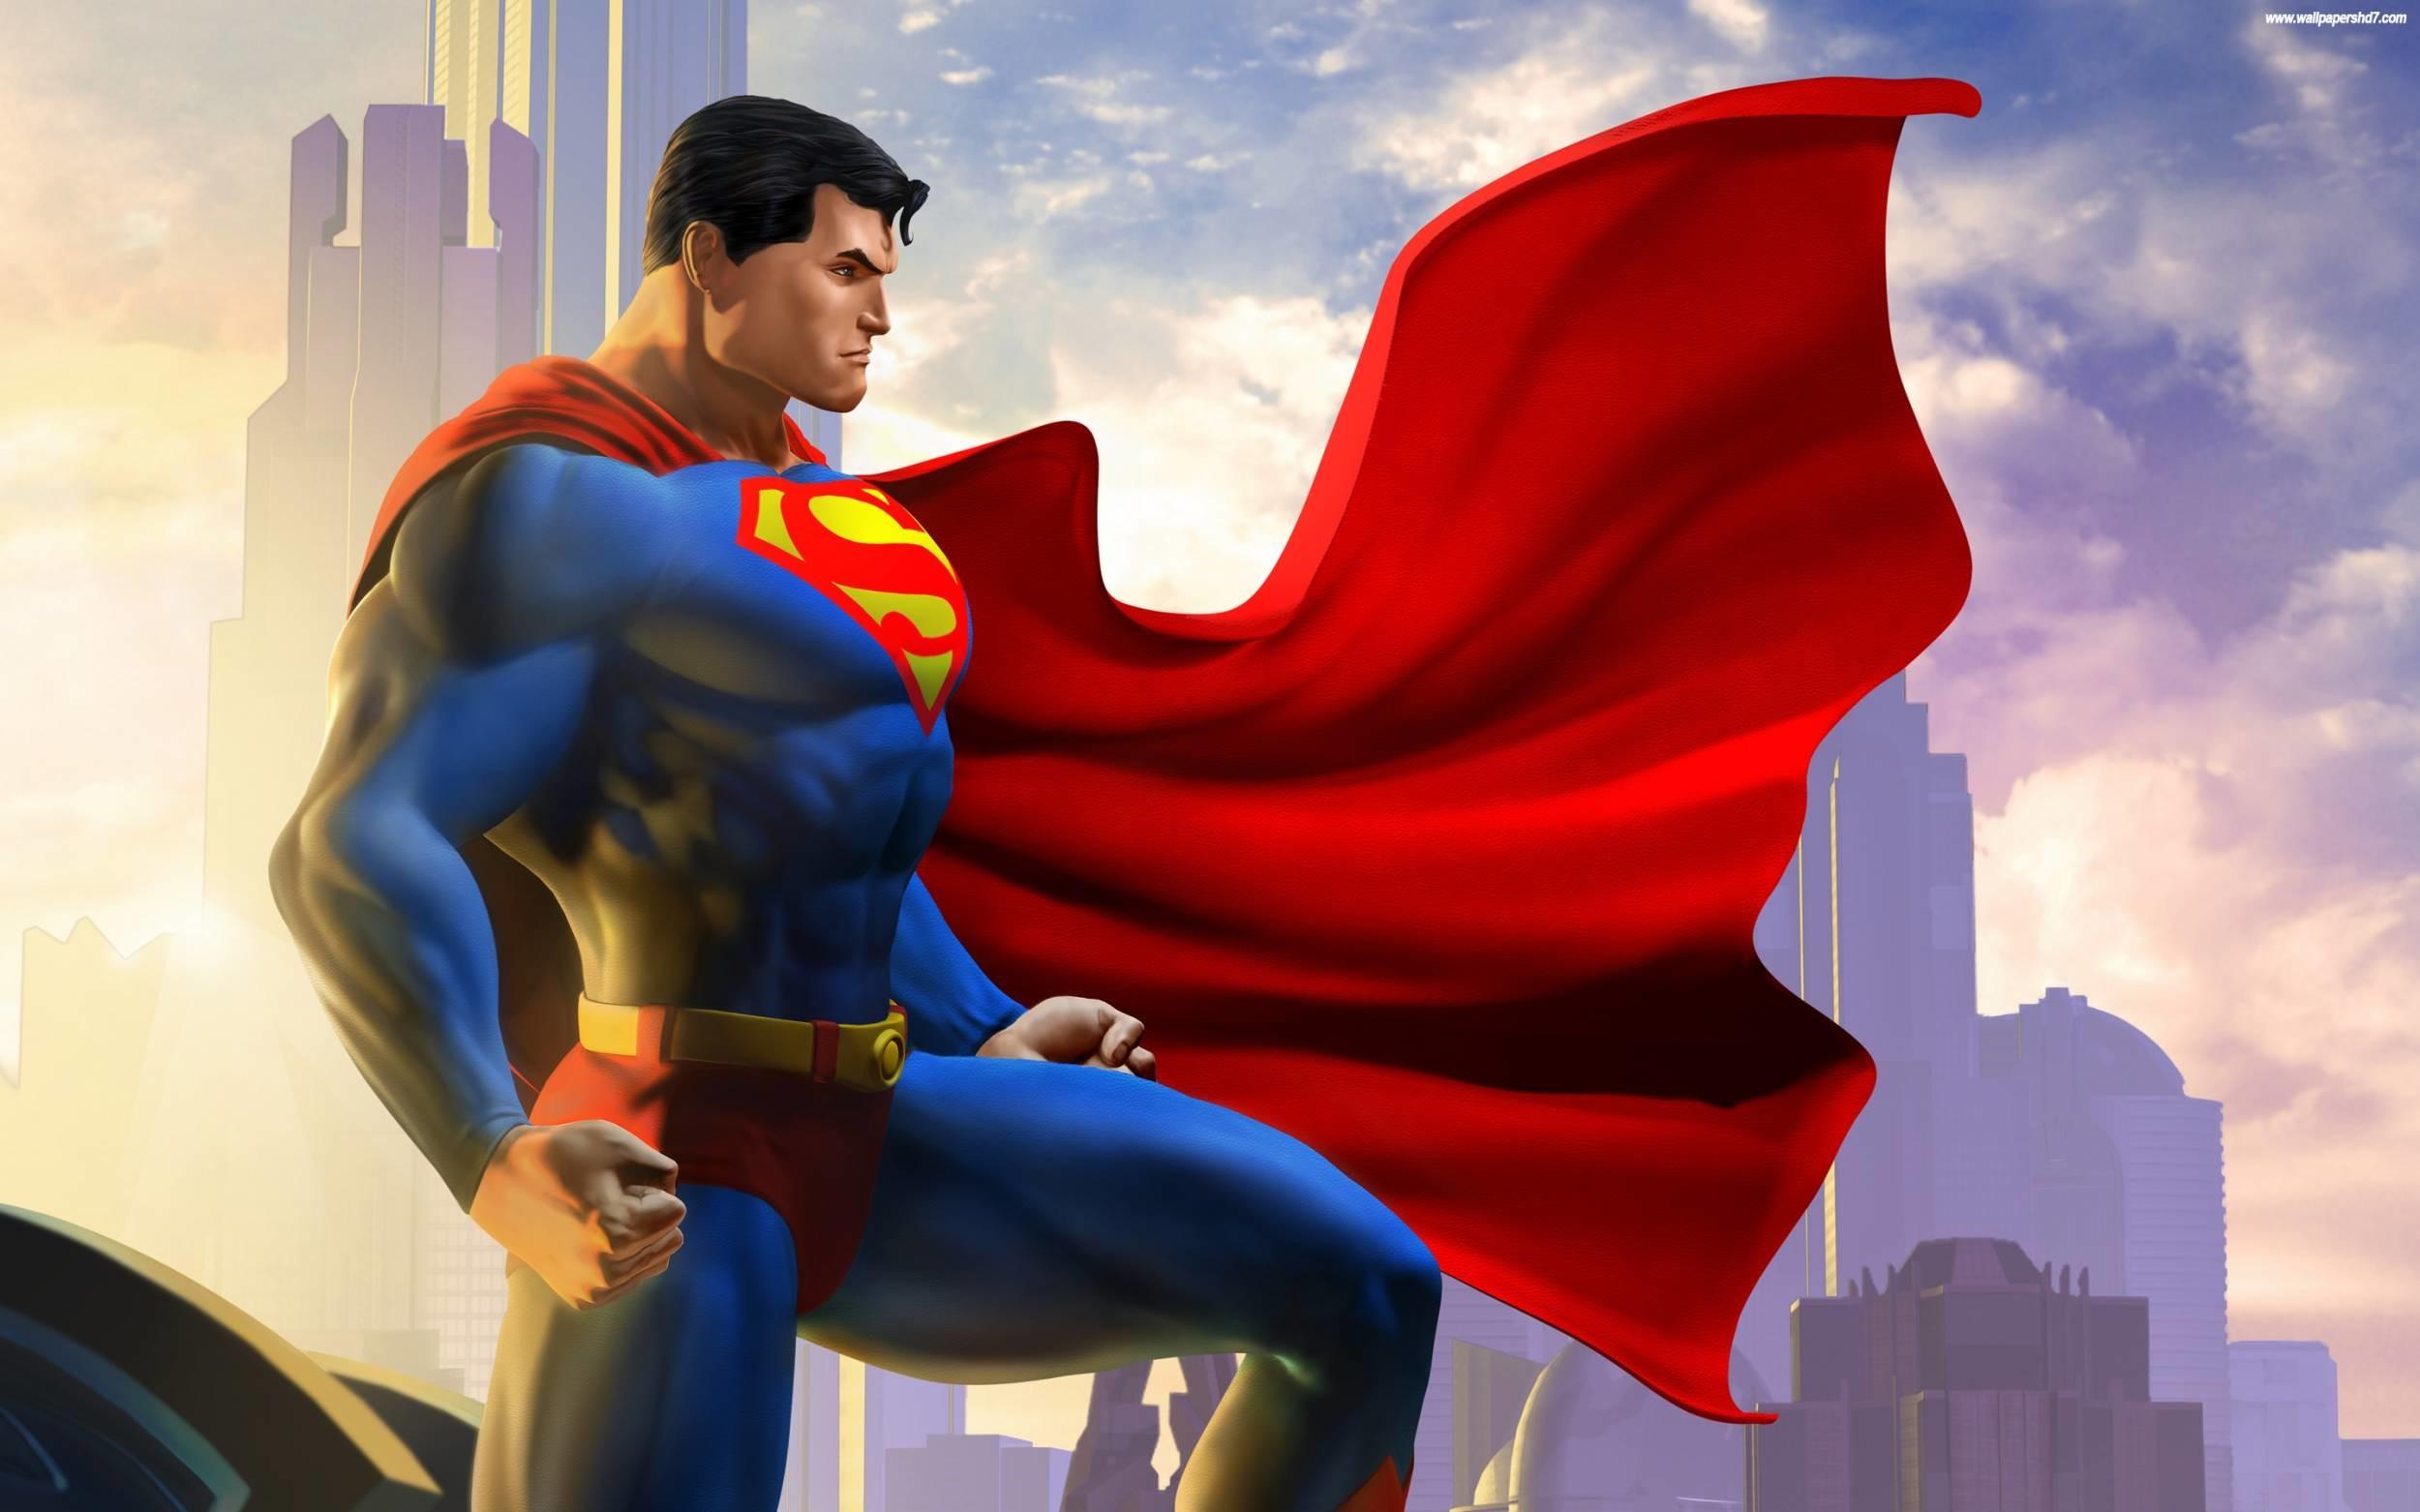 Cool Superman Wallpaper (65+ Images